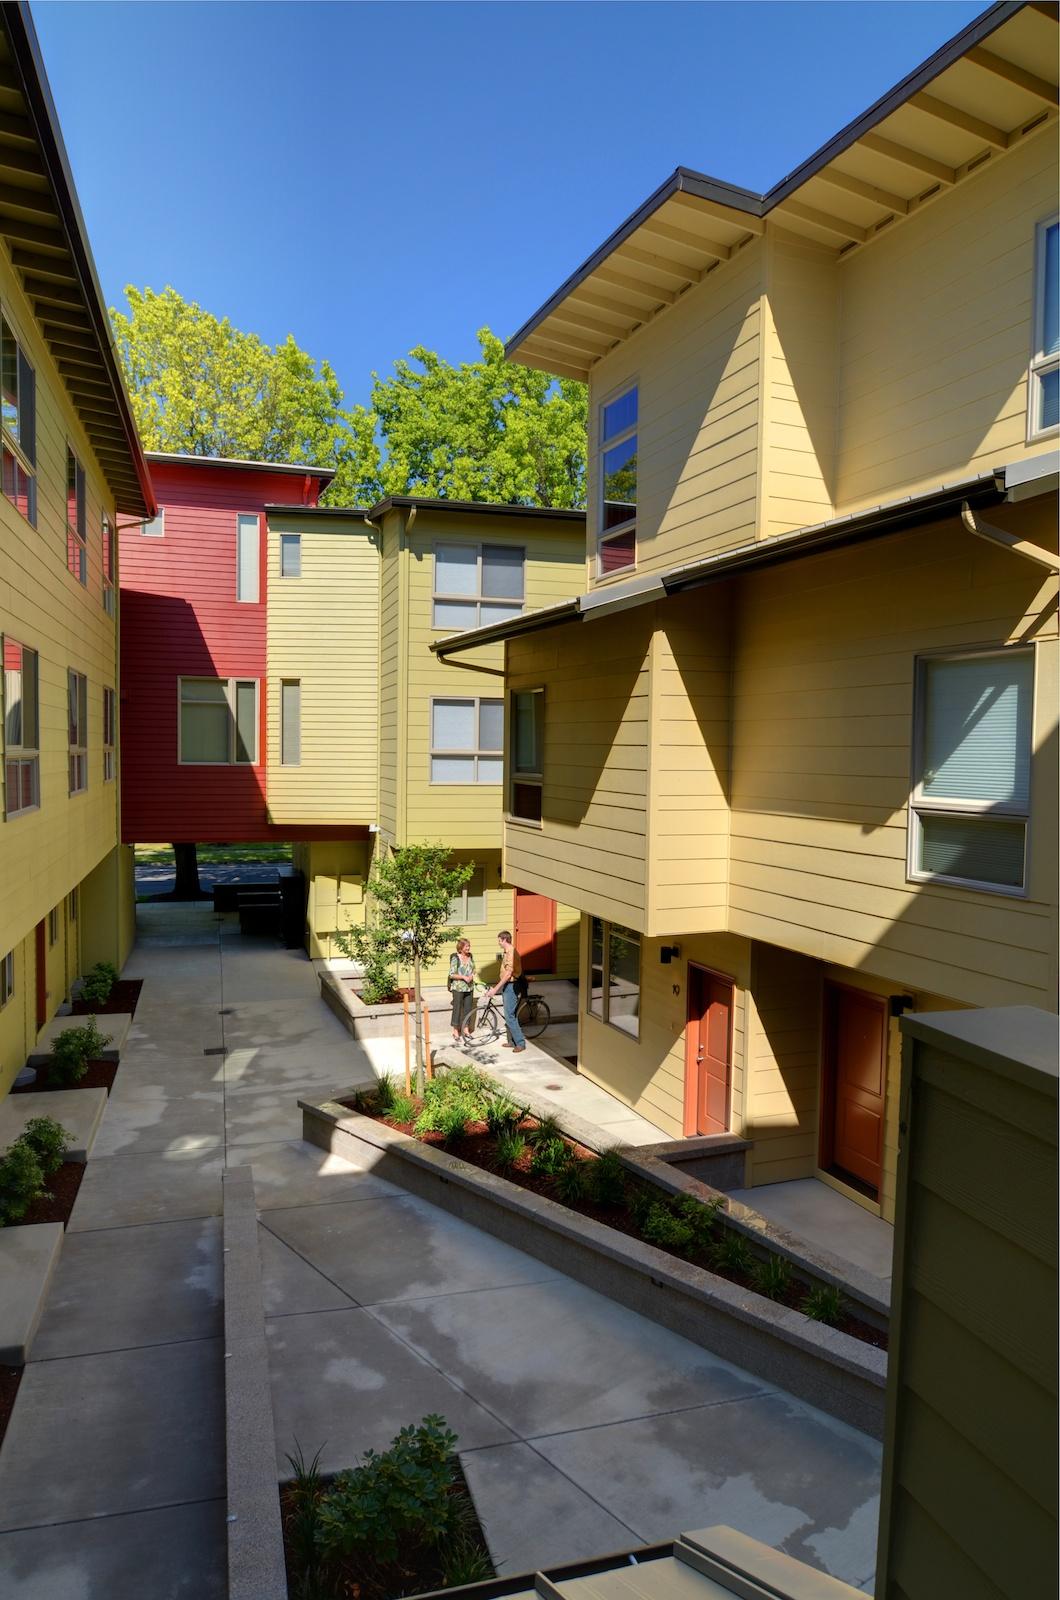 1015_26_OTown_Courtyard4.jpg